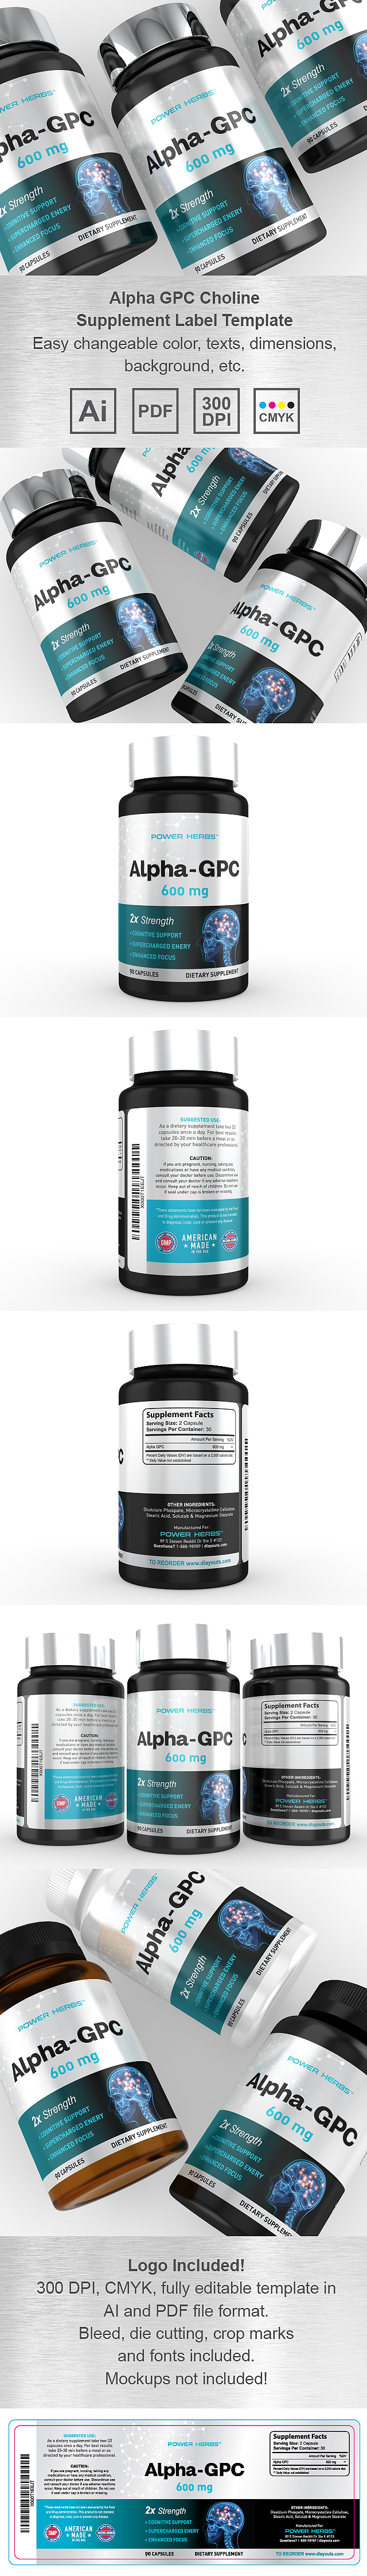 Alpha GPC Choline Supplement Label Template